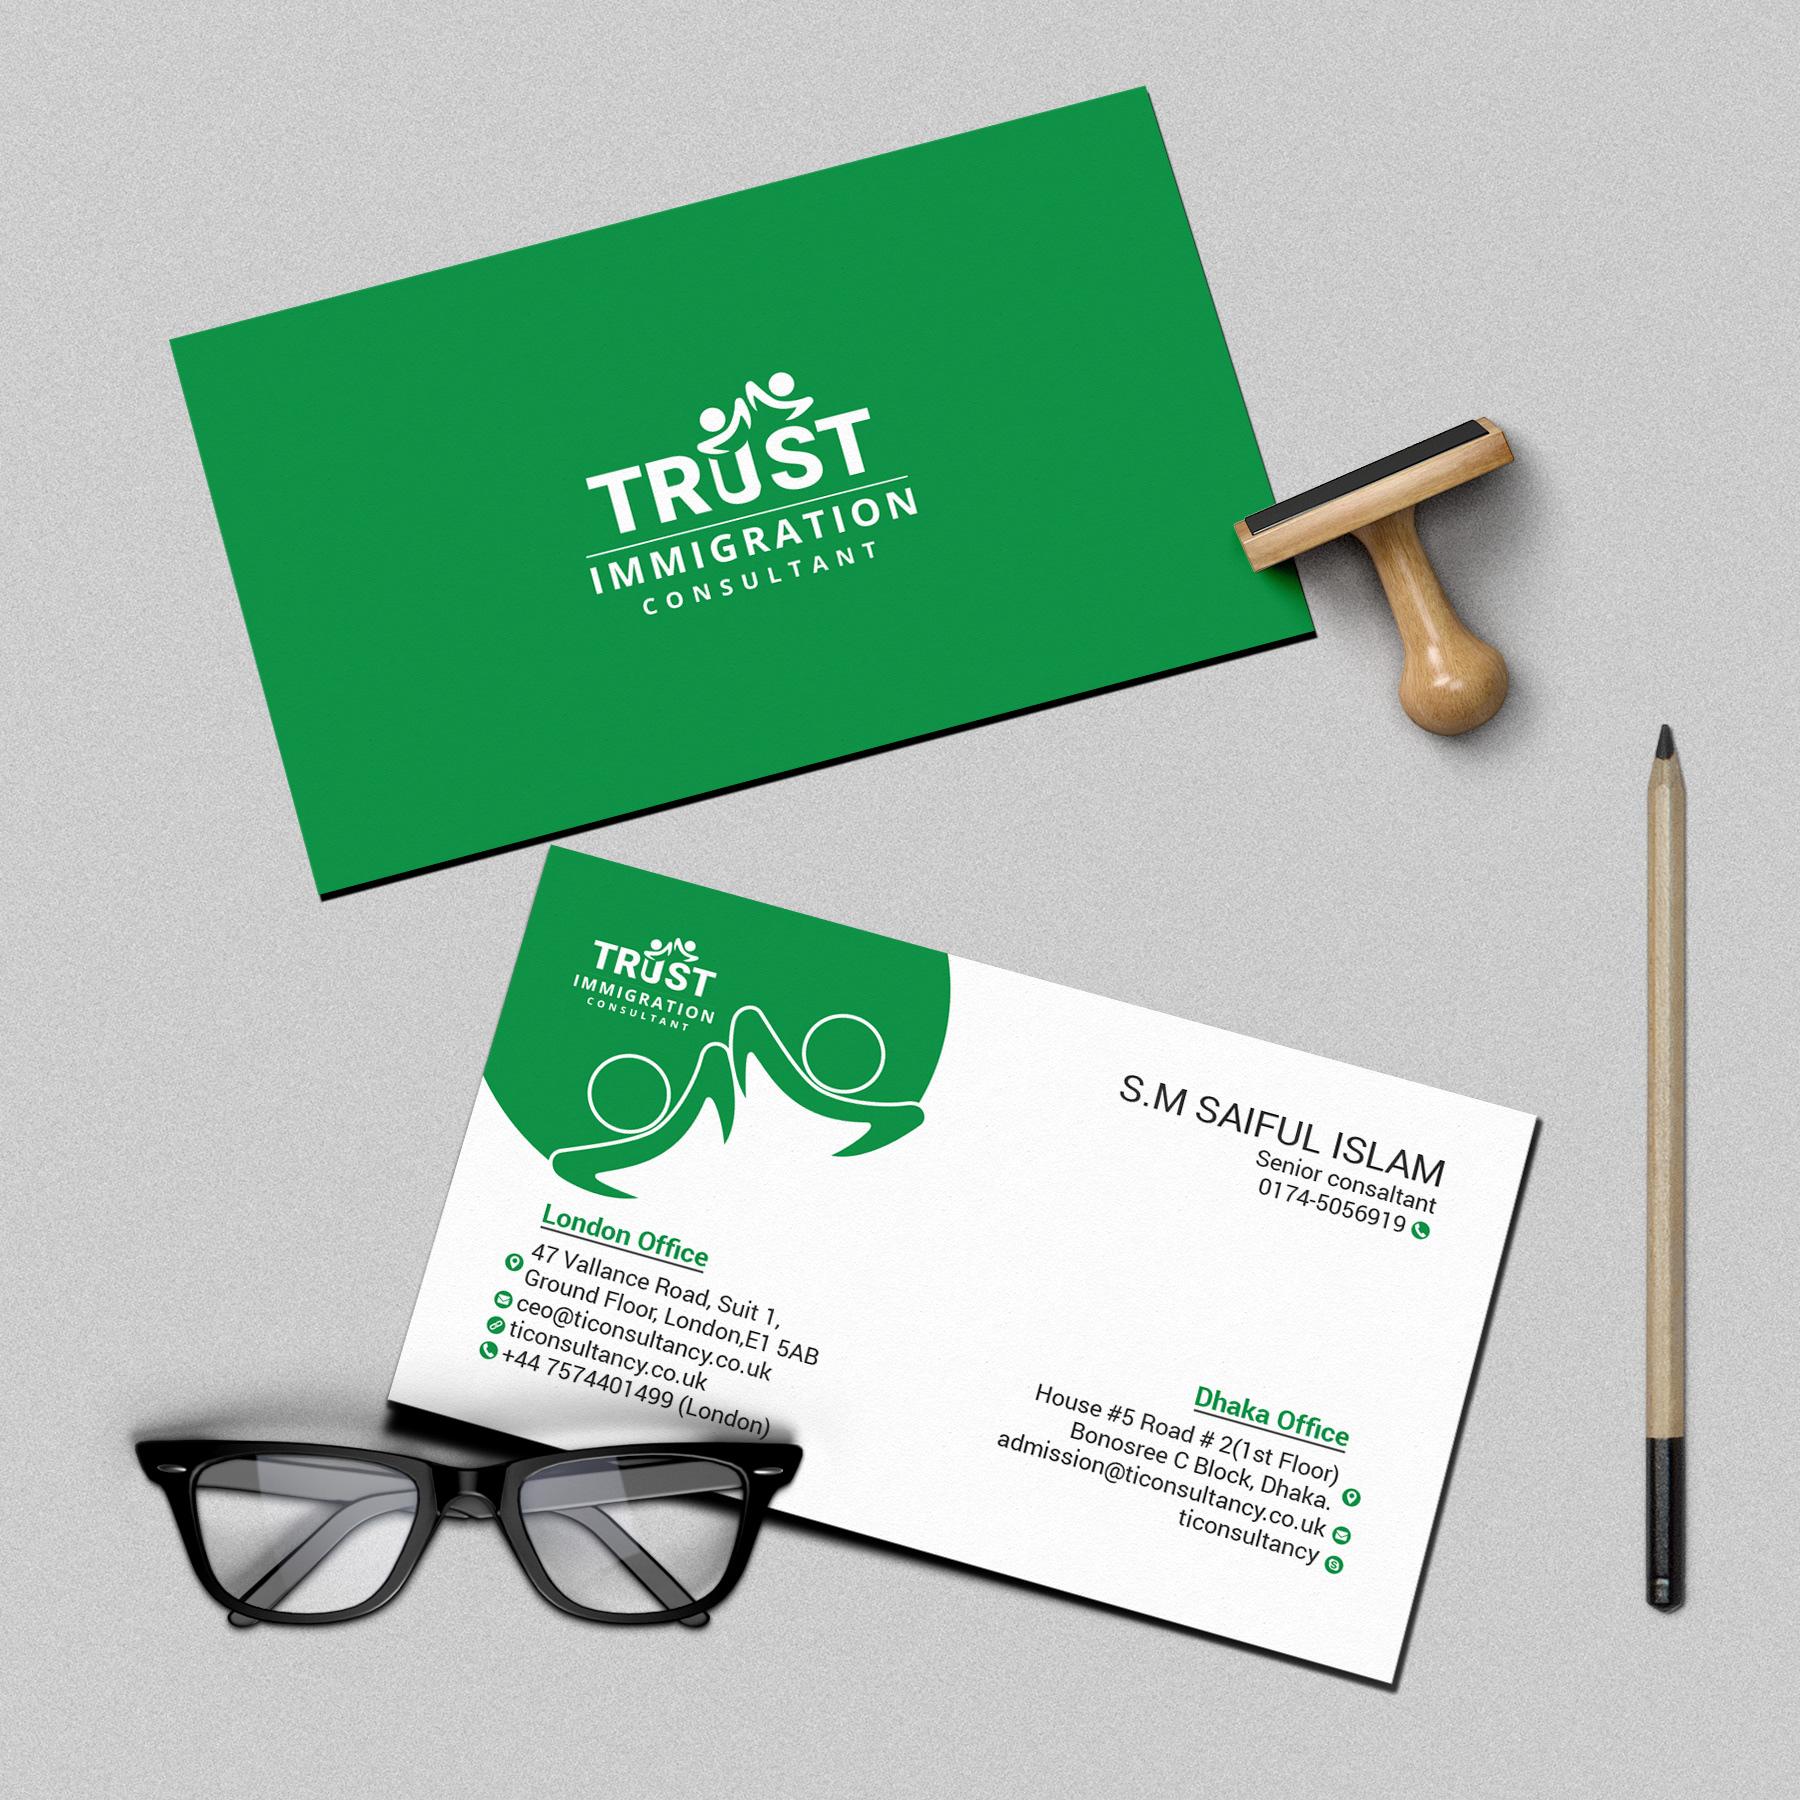 TRUST IMMIGRATION CONSULTANT (Brand Identity Design) on Behance